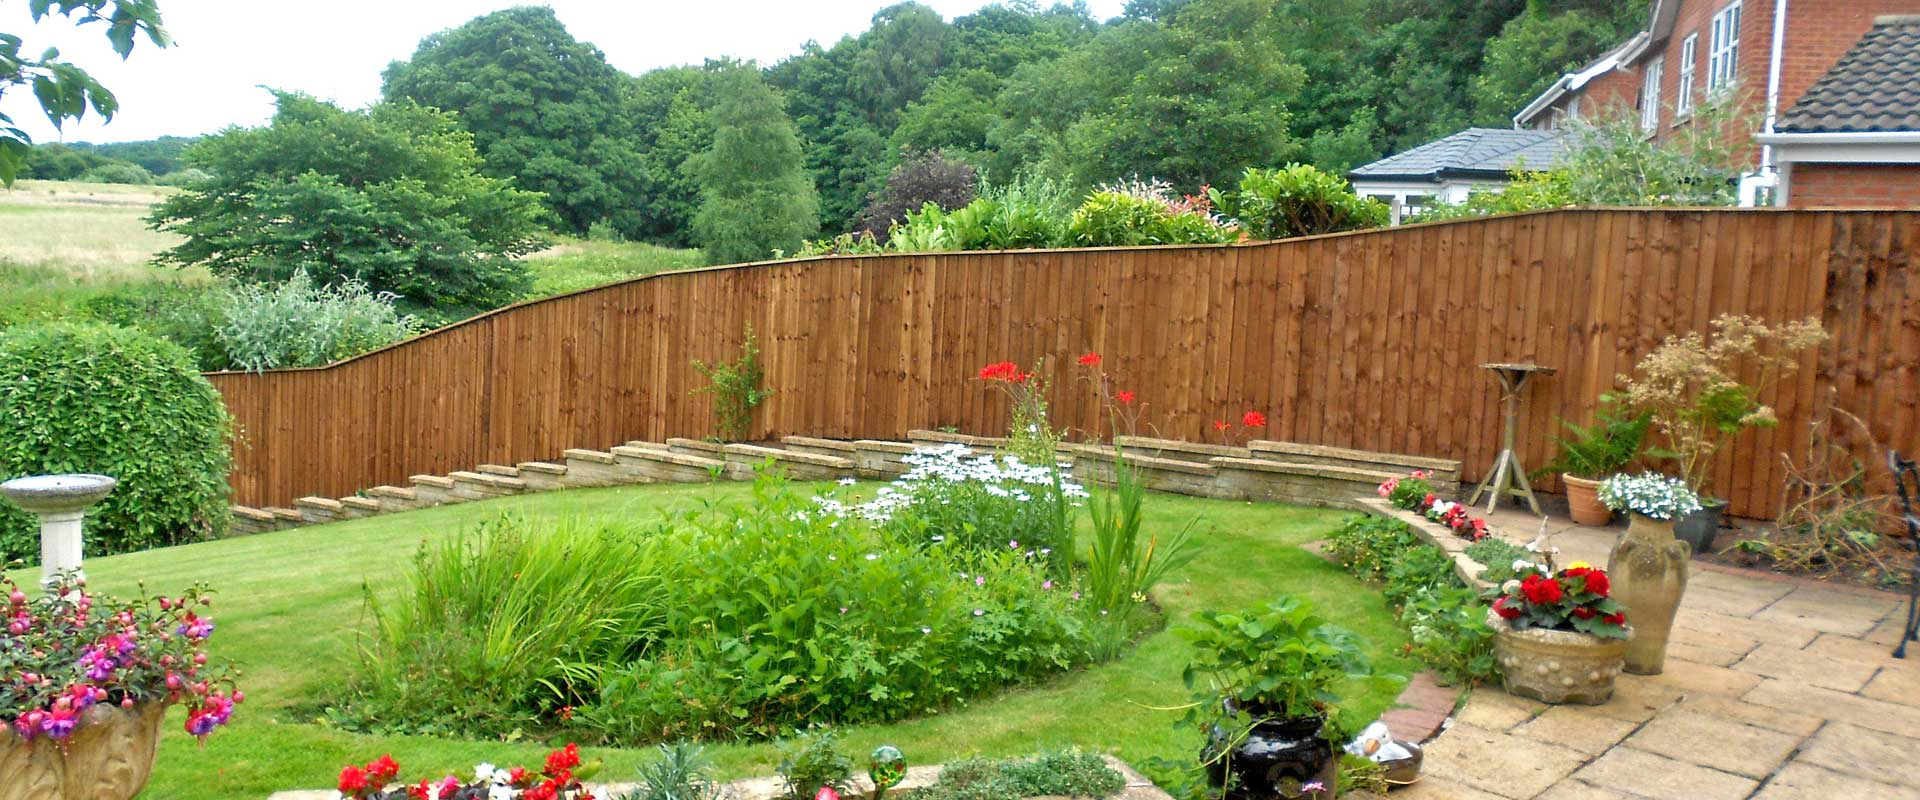 Garden Fencing In Chorley